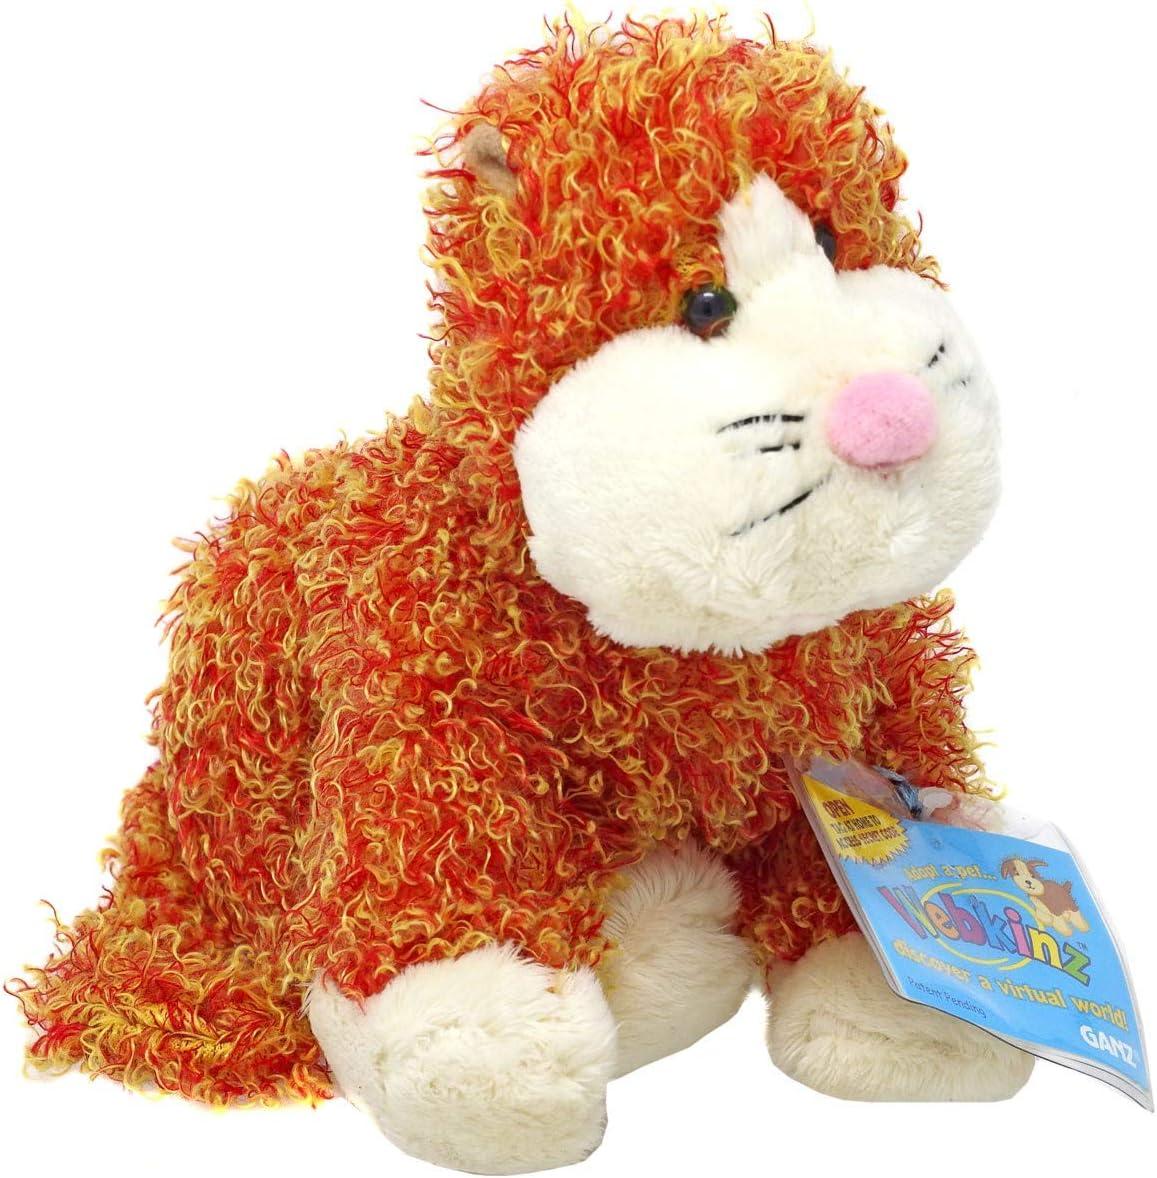 B000JZ06K0 Webkinz Plush Stuffed Animal Cheeky Cat Retired! 71PC15OtOgL.SL1200_